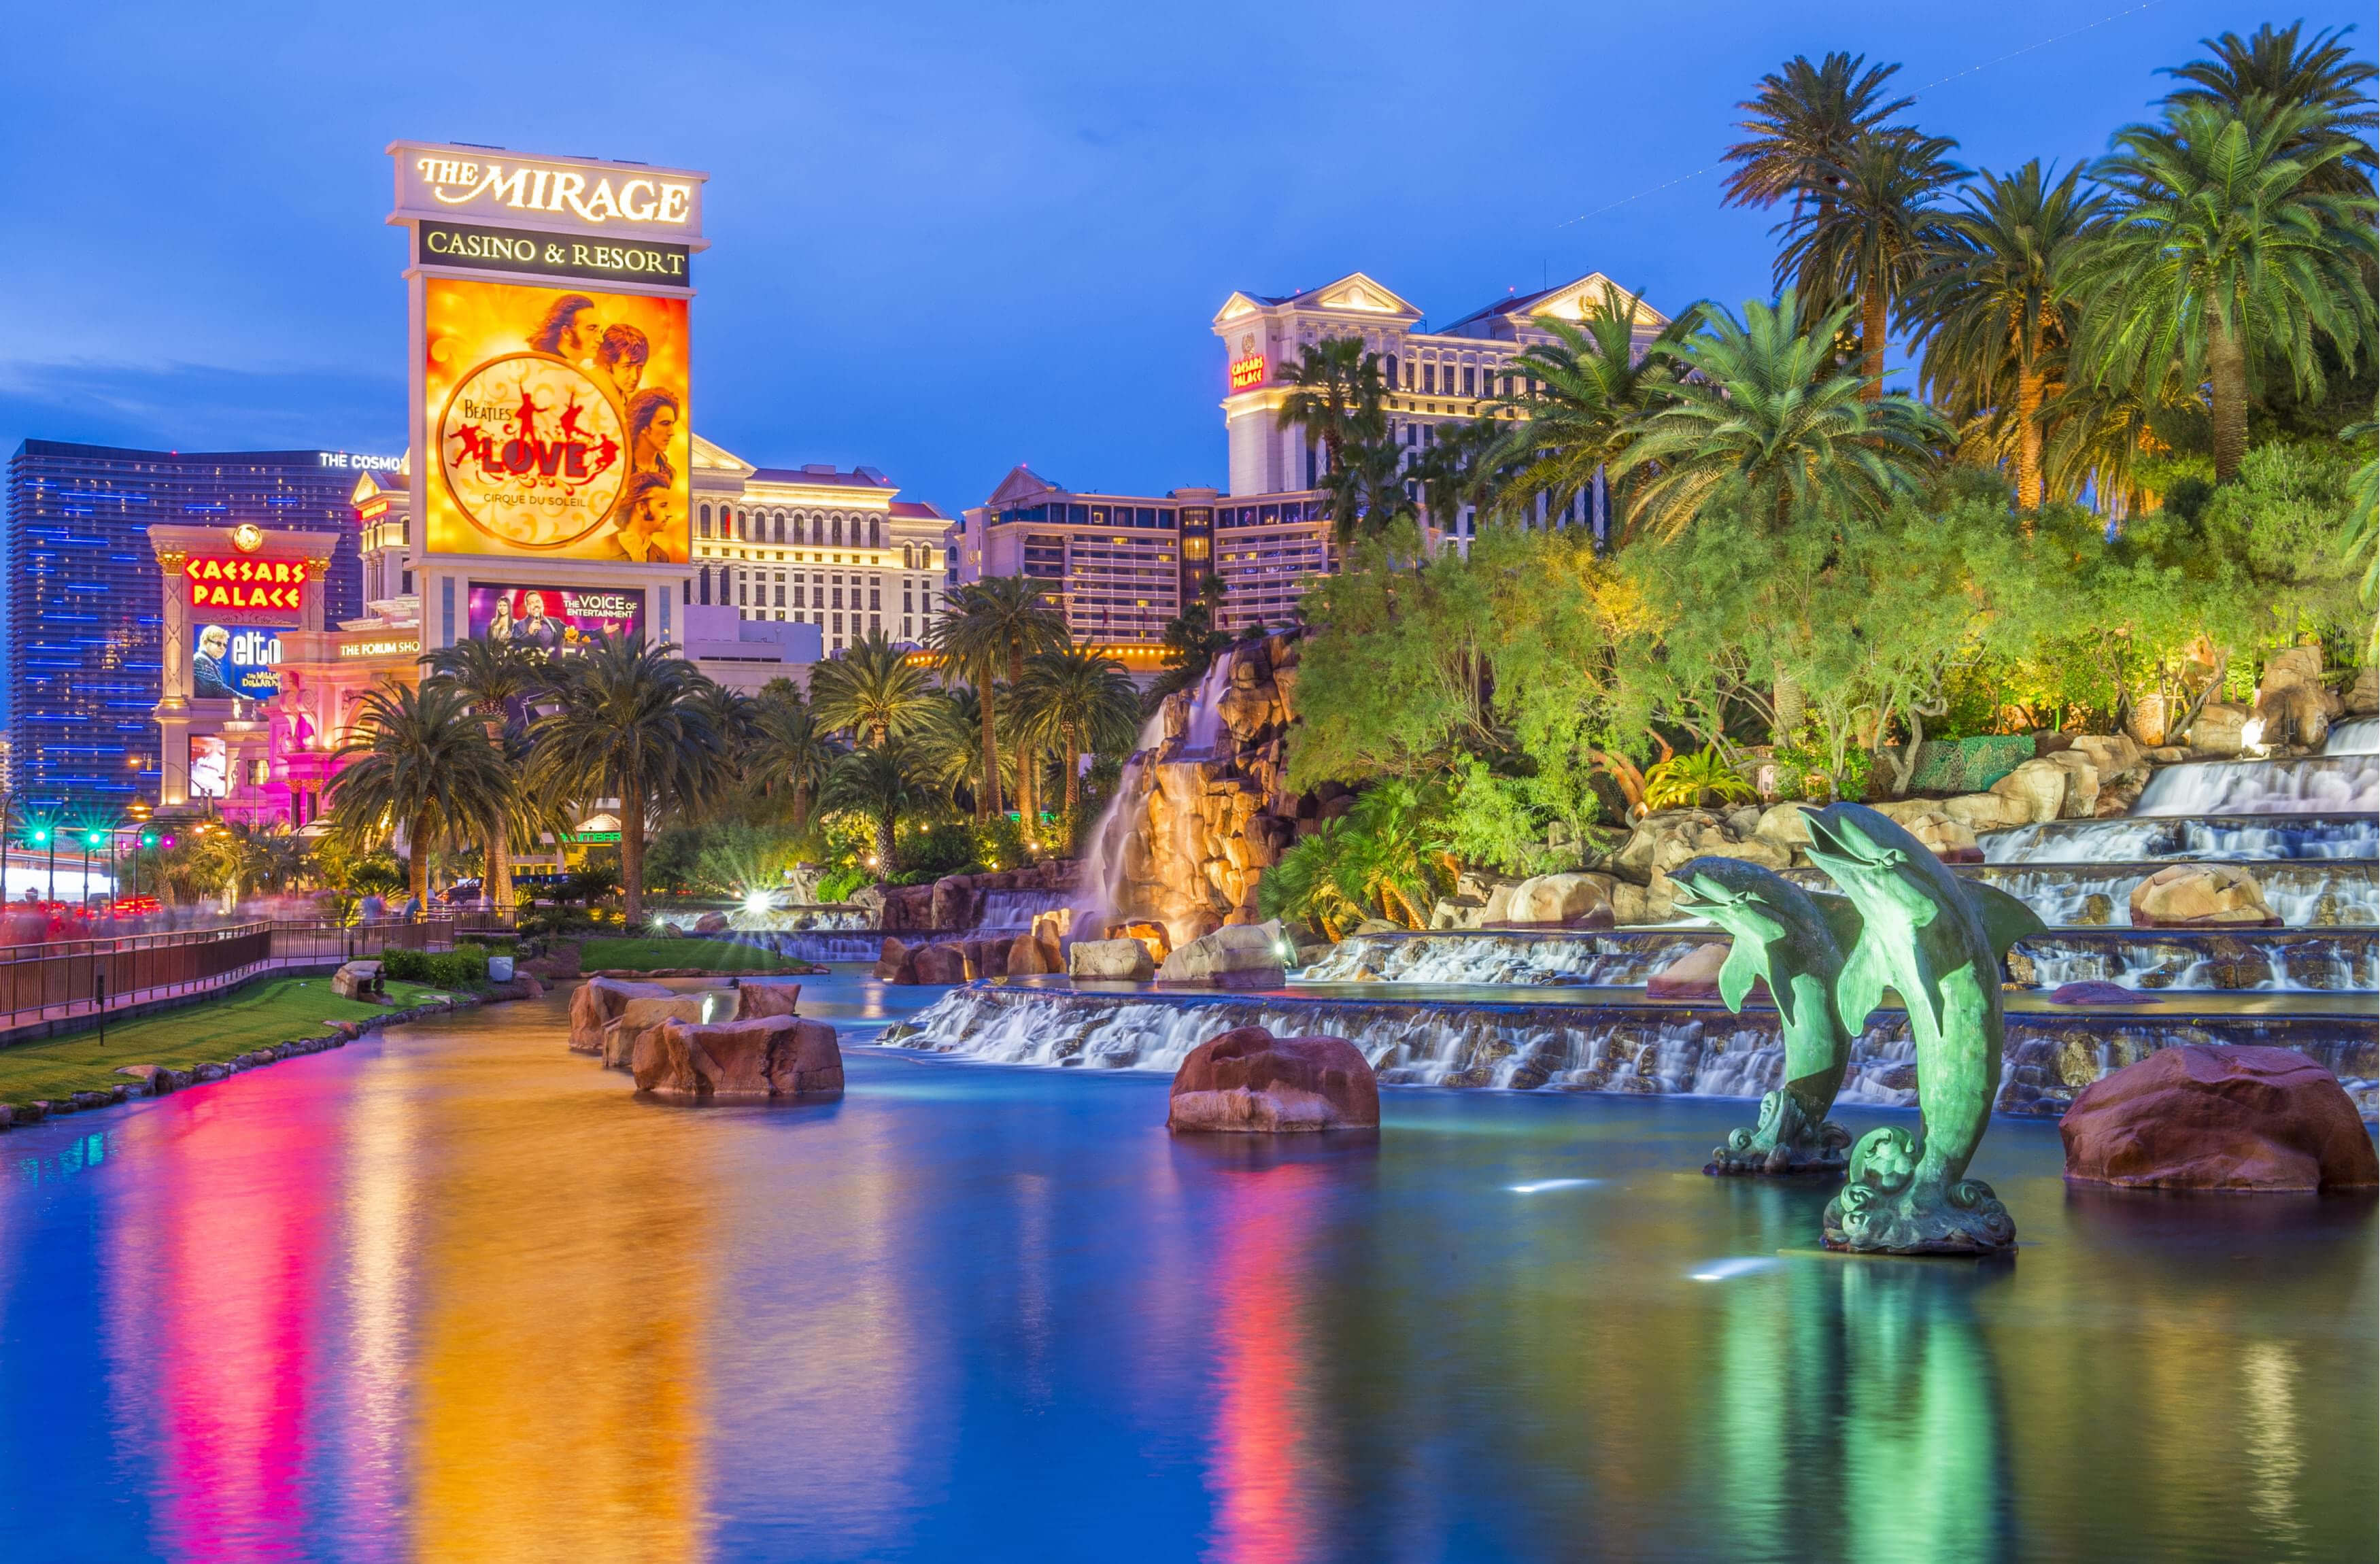 Save the Date LeadsCon 2019 in Las Vegas